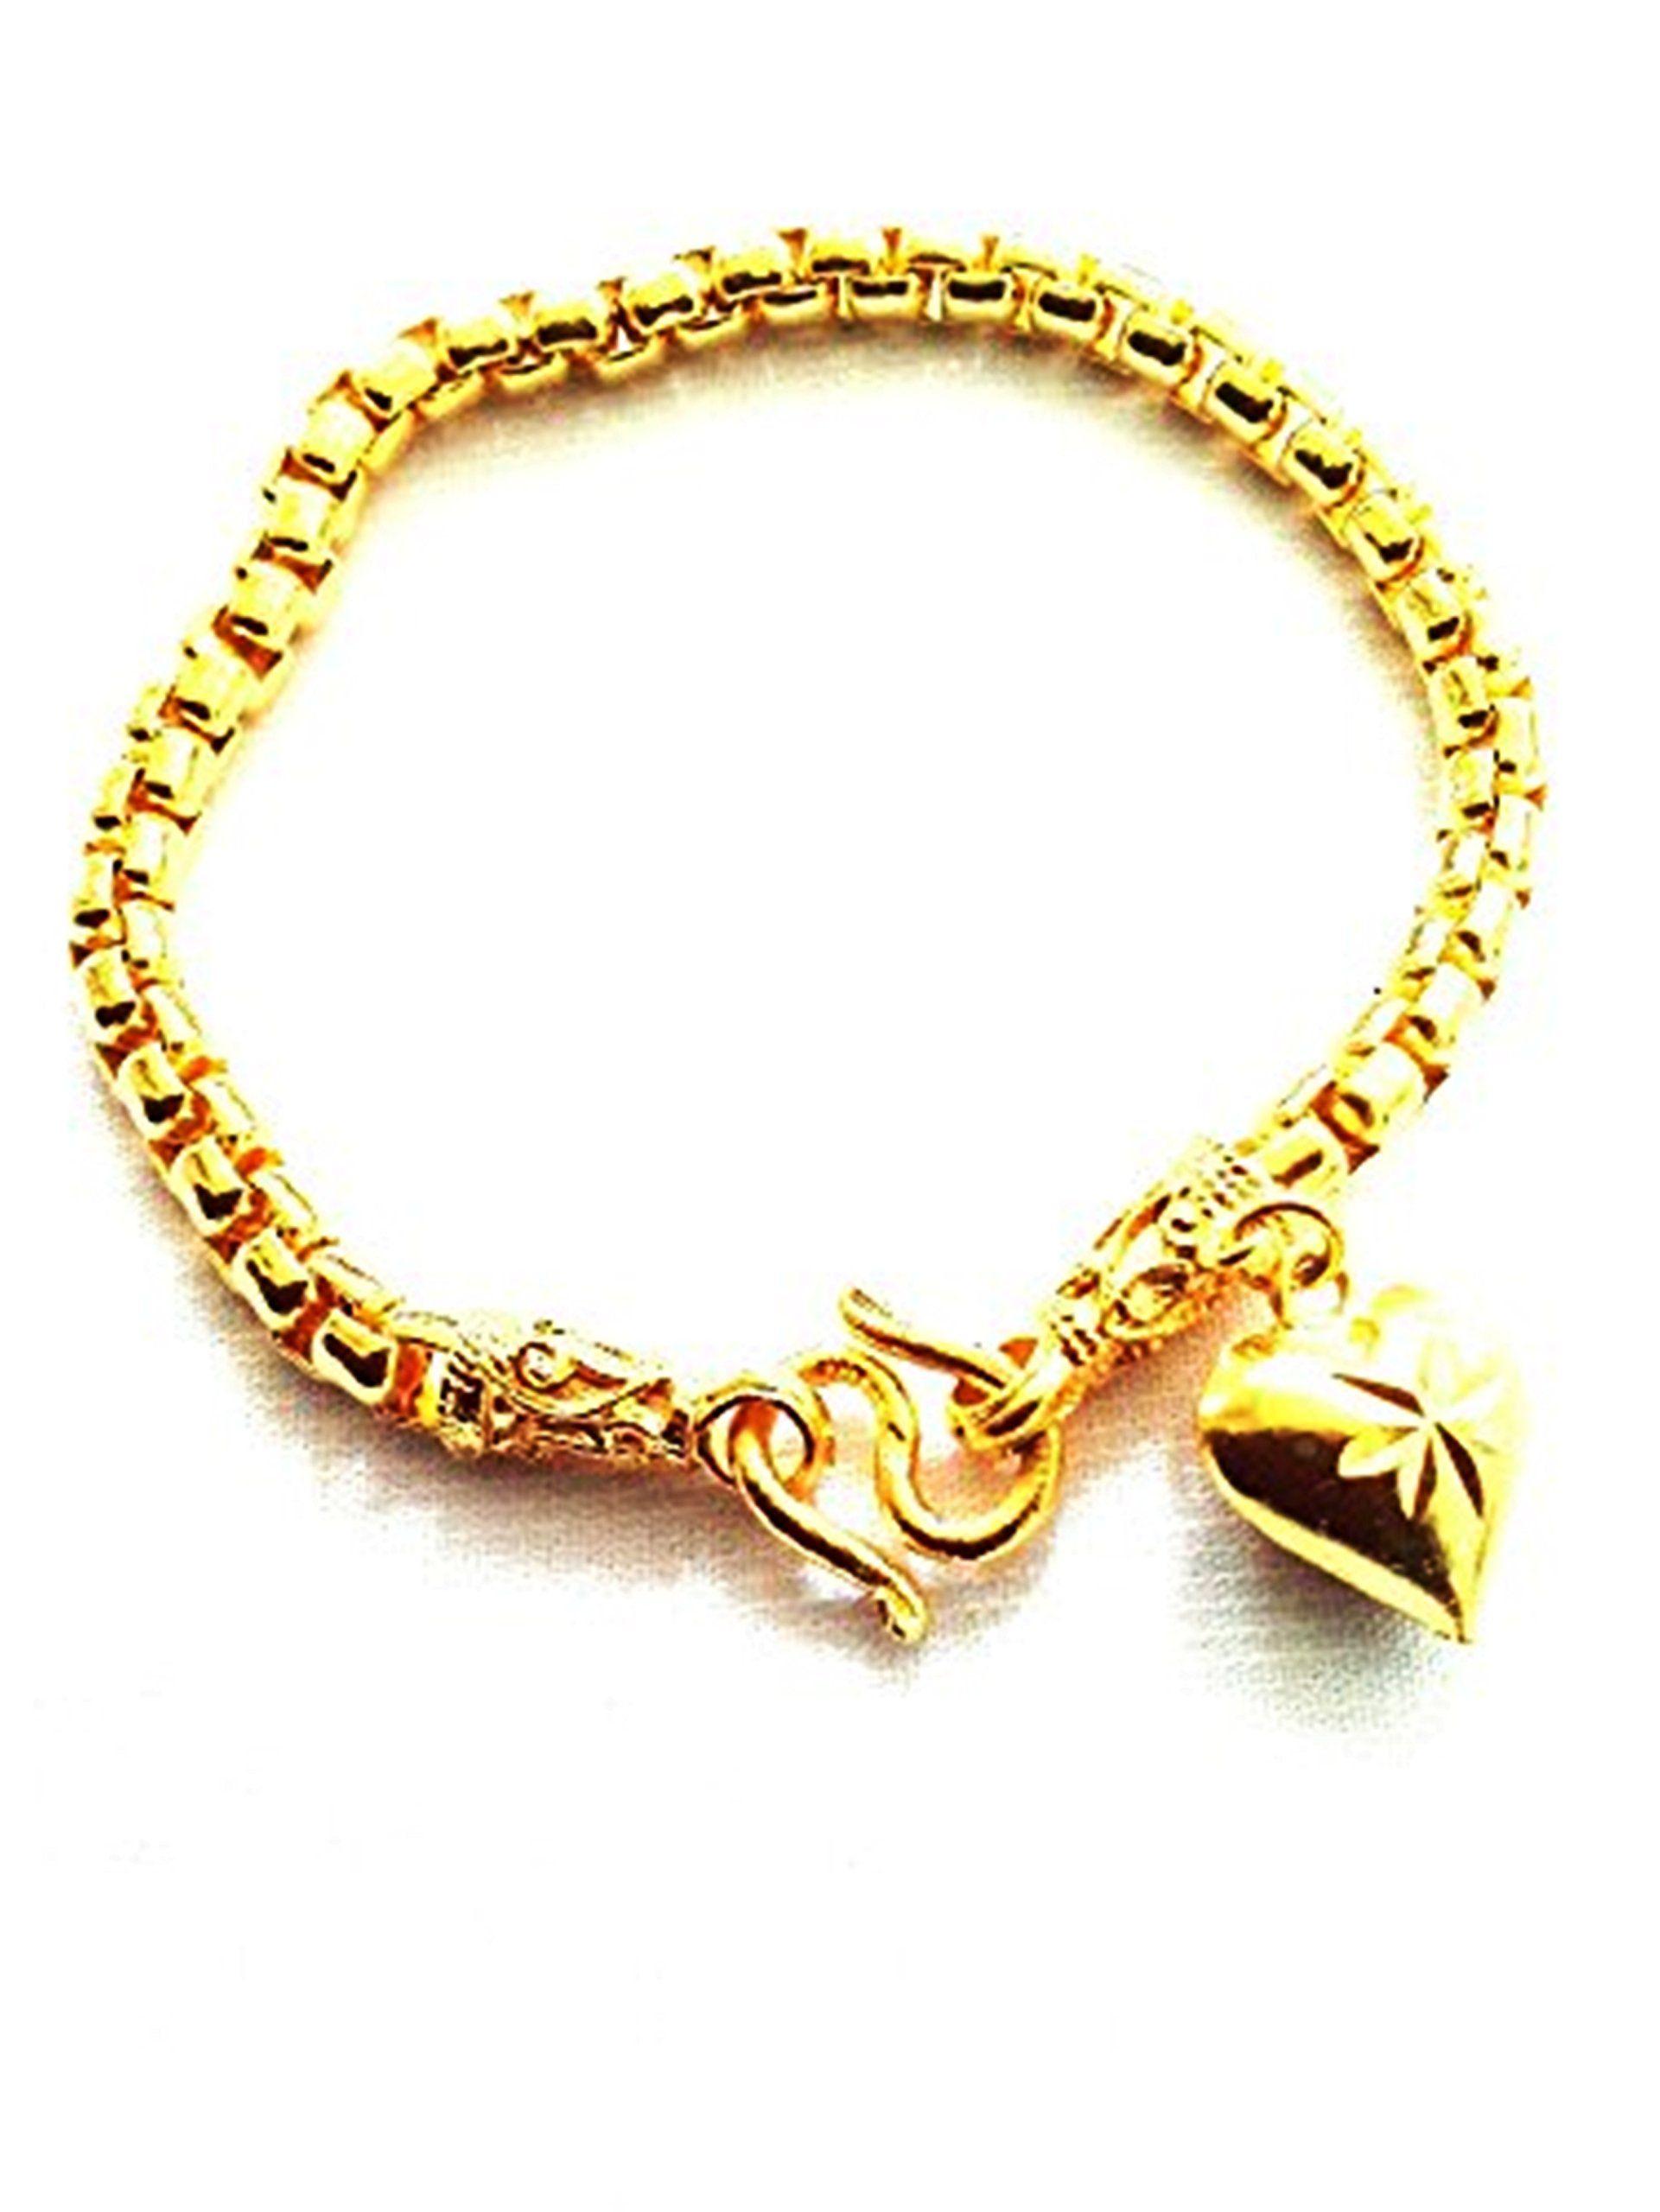 Elegant Thai 22k 23k 24k Gold Plated Gp Bracelet Bangle Jewelry 22K